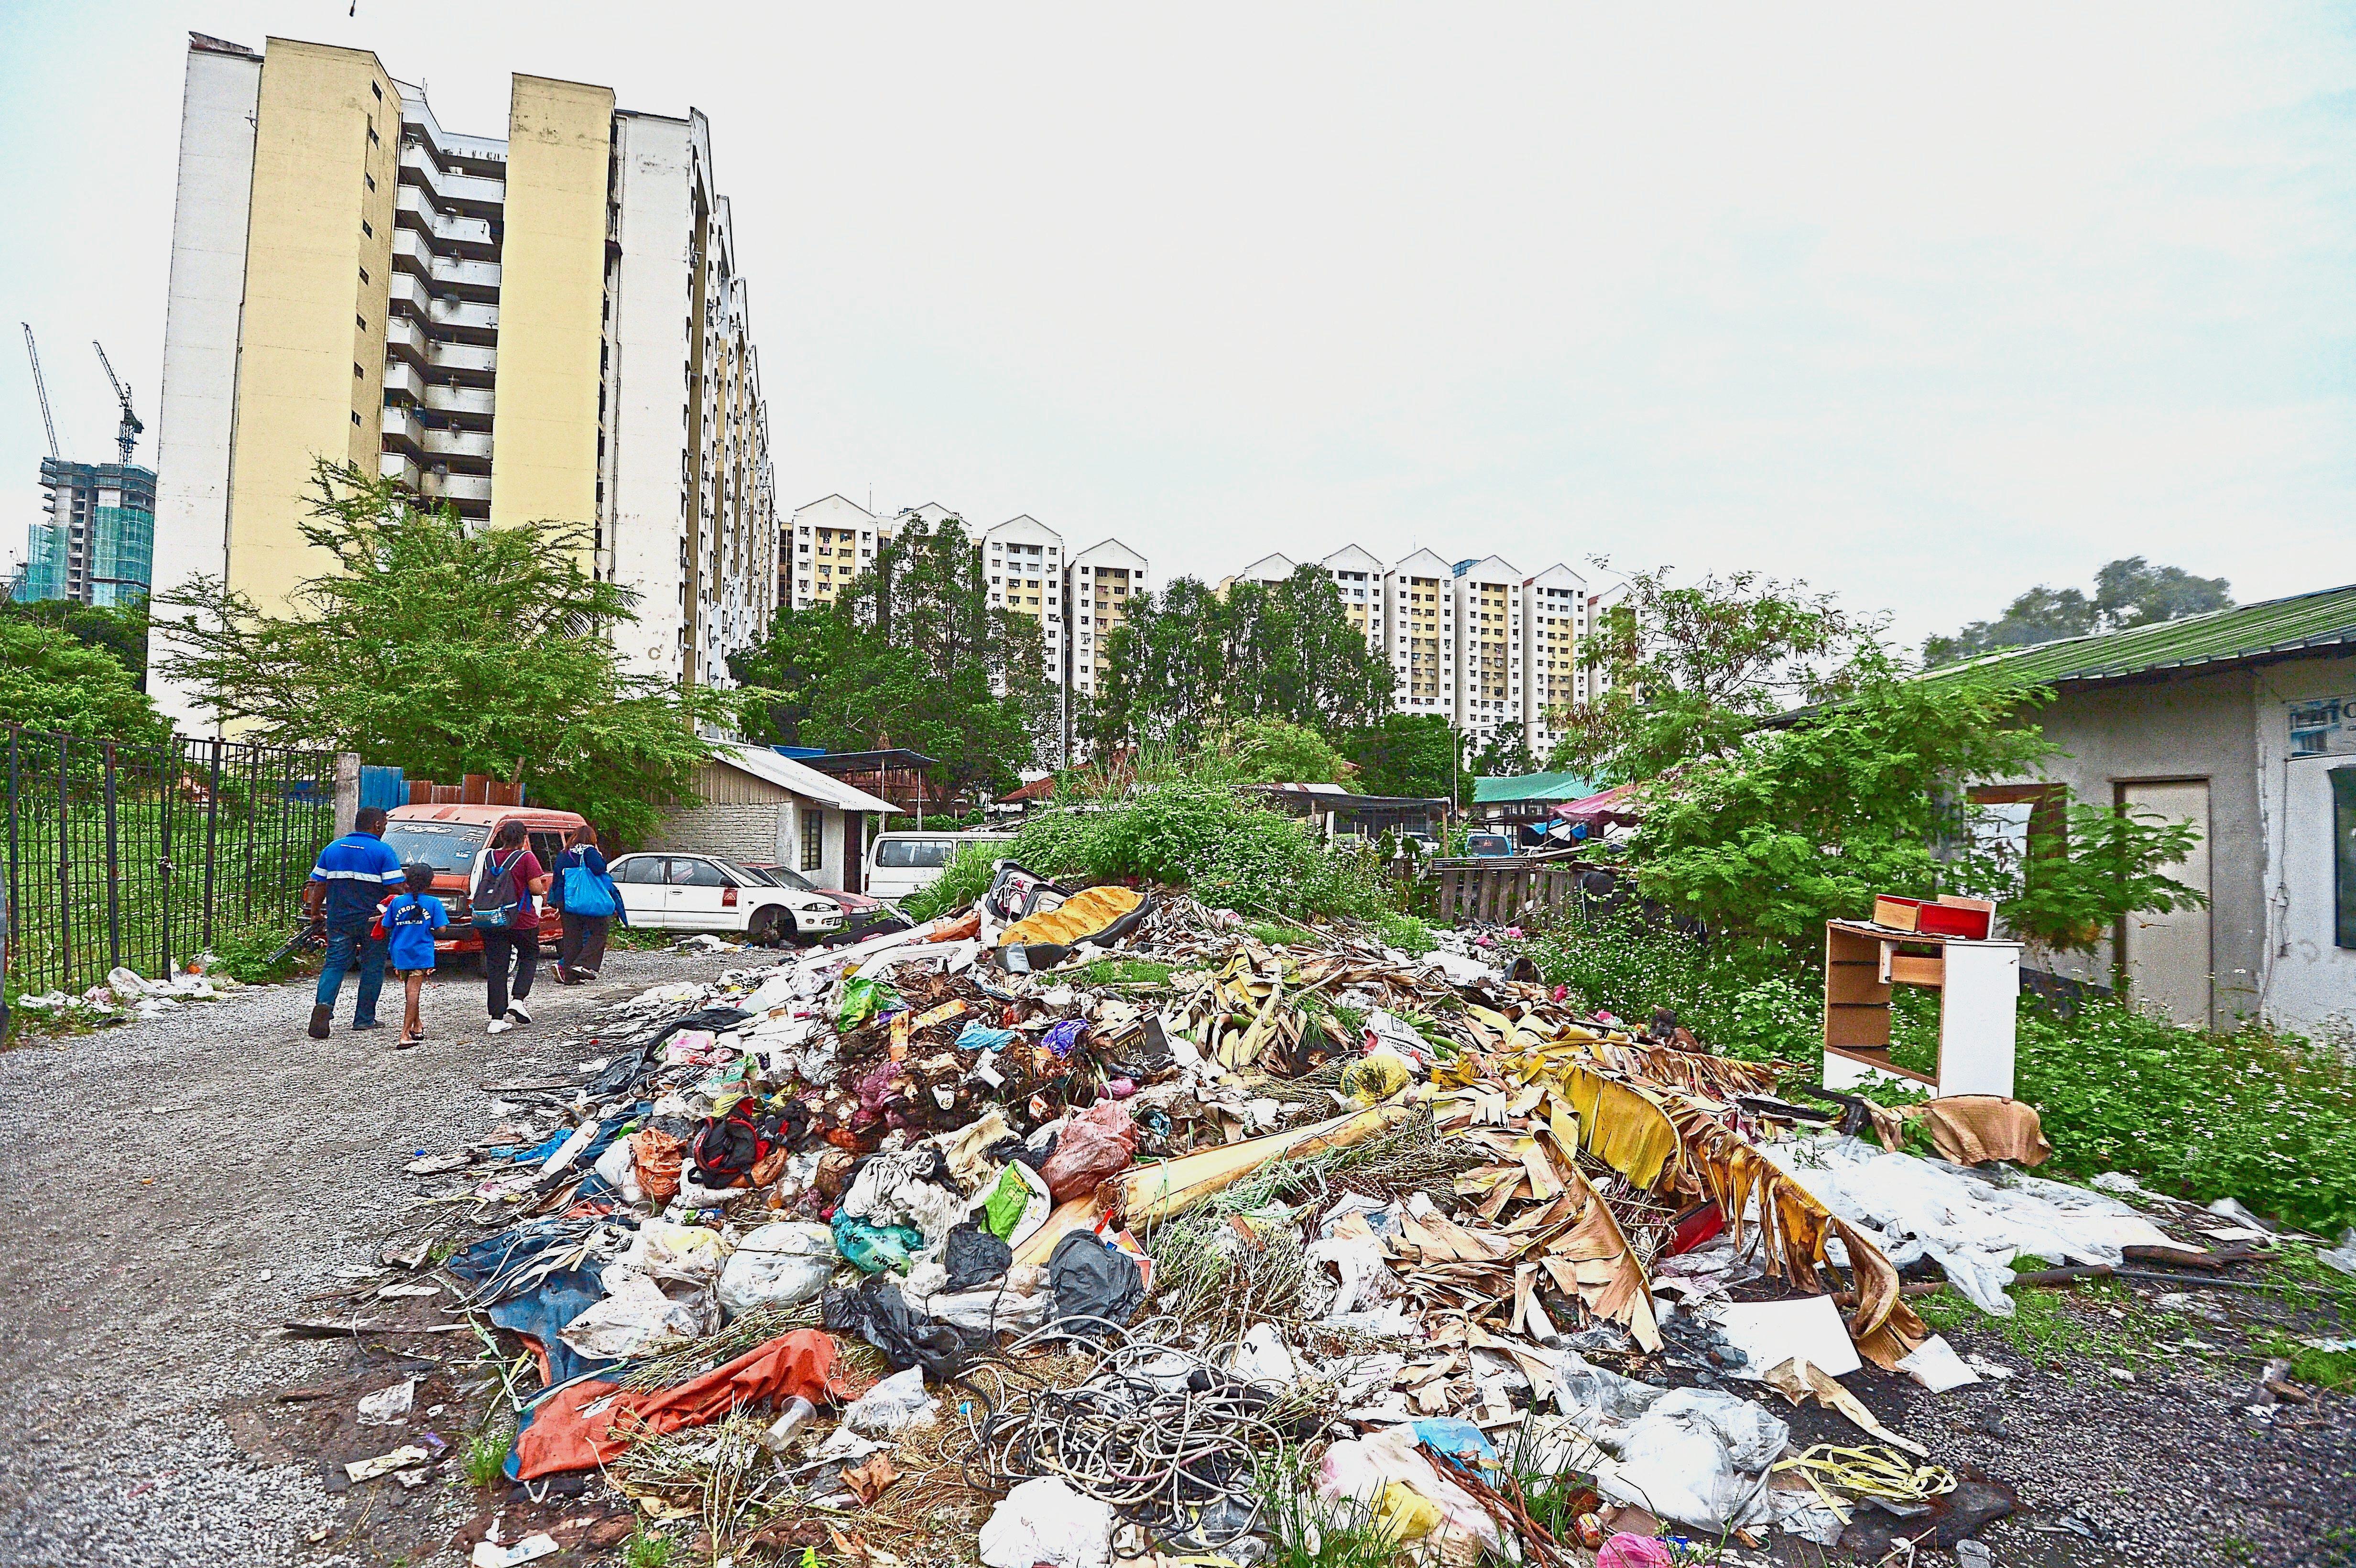 Children have to walk past this heap of trash at a vacant land on their way home to PPR Taman Putra Damai Lembah Subang in Kelana Jaya. — Photos: RAJA FAISAL HISHAN/The Star